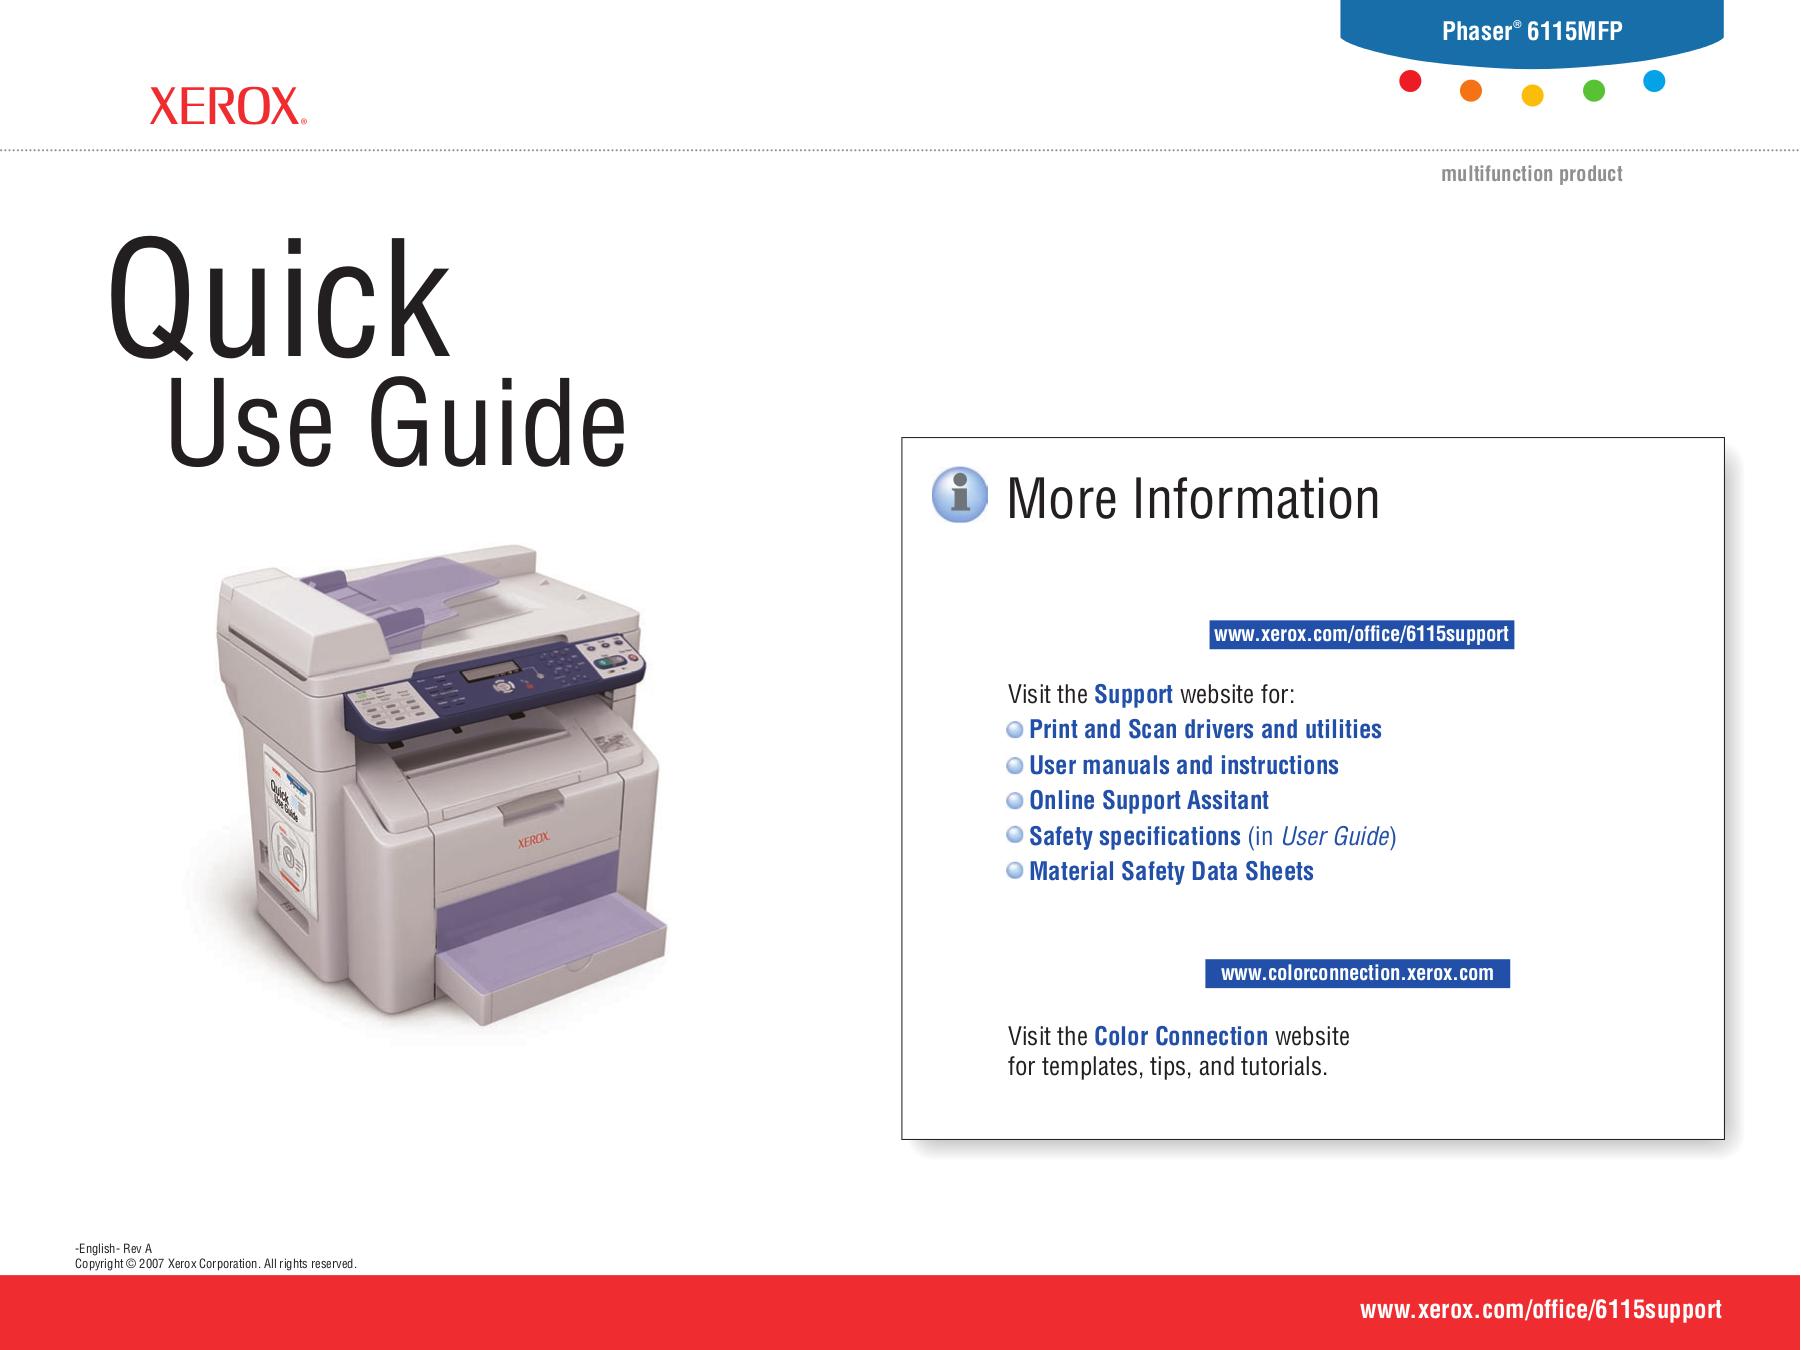 download free pdf for xerox phaser 6115mfp multifunction printer manual rh umlib com Xerox Phaser 3600 xerox phaser 6115 mfp service manual